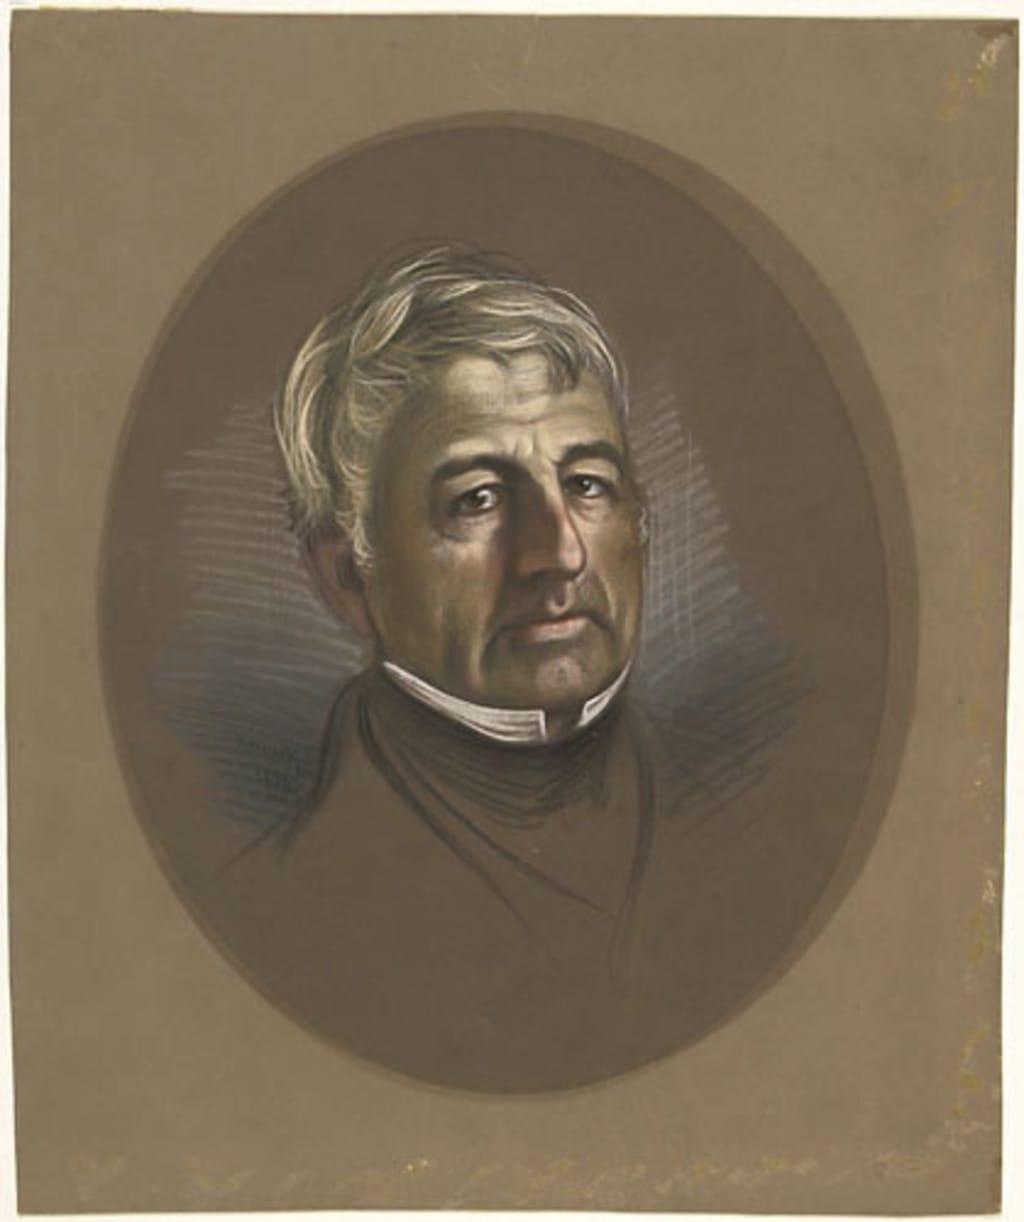 François-Xavier Malhiot